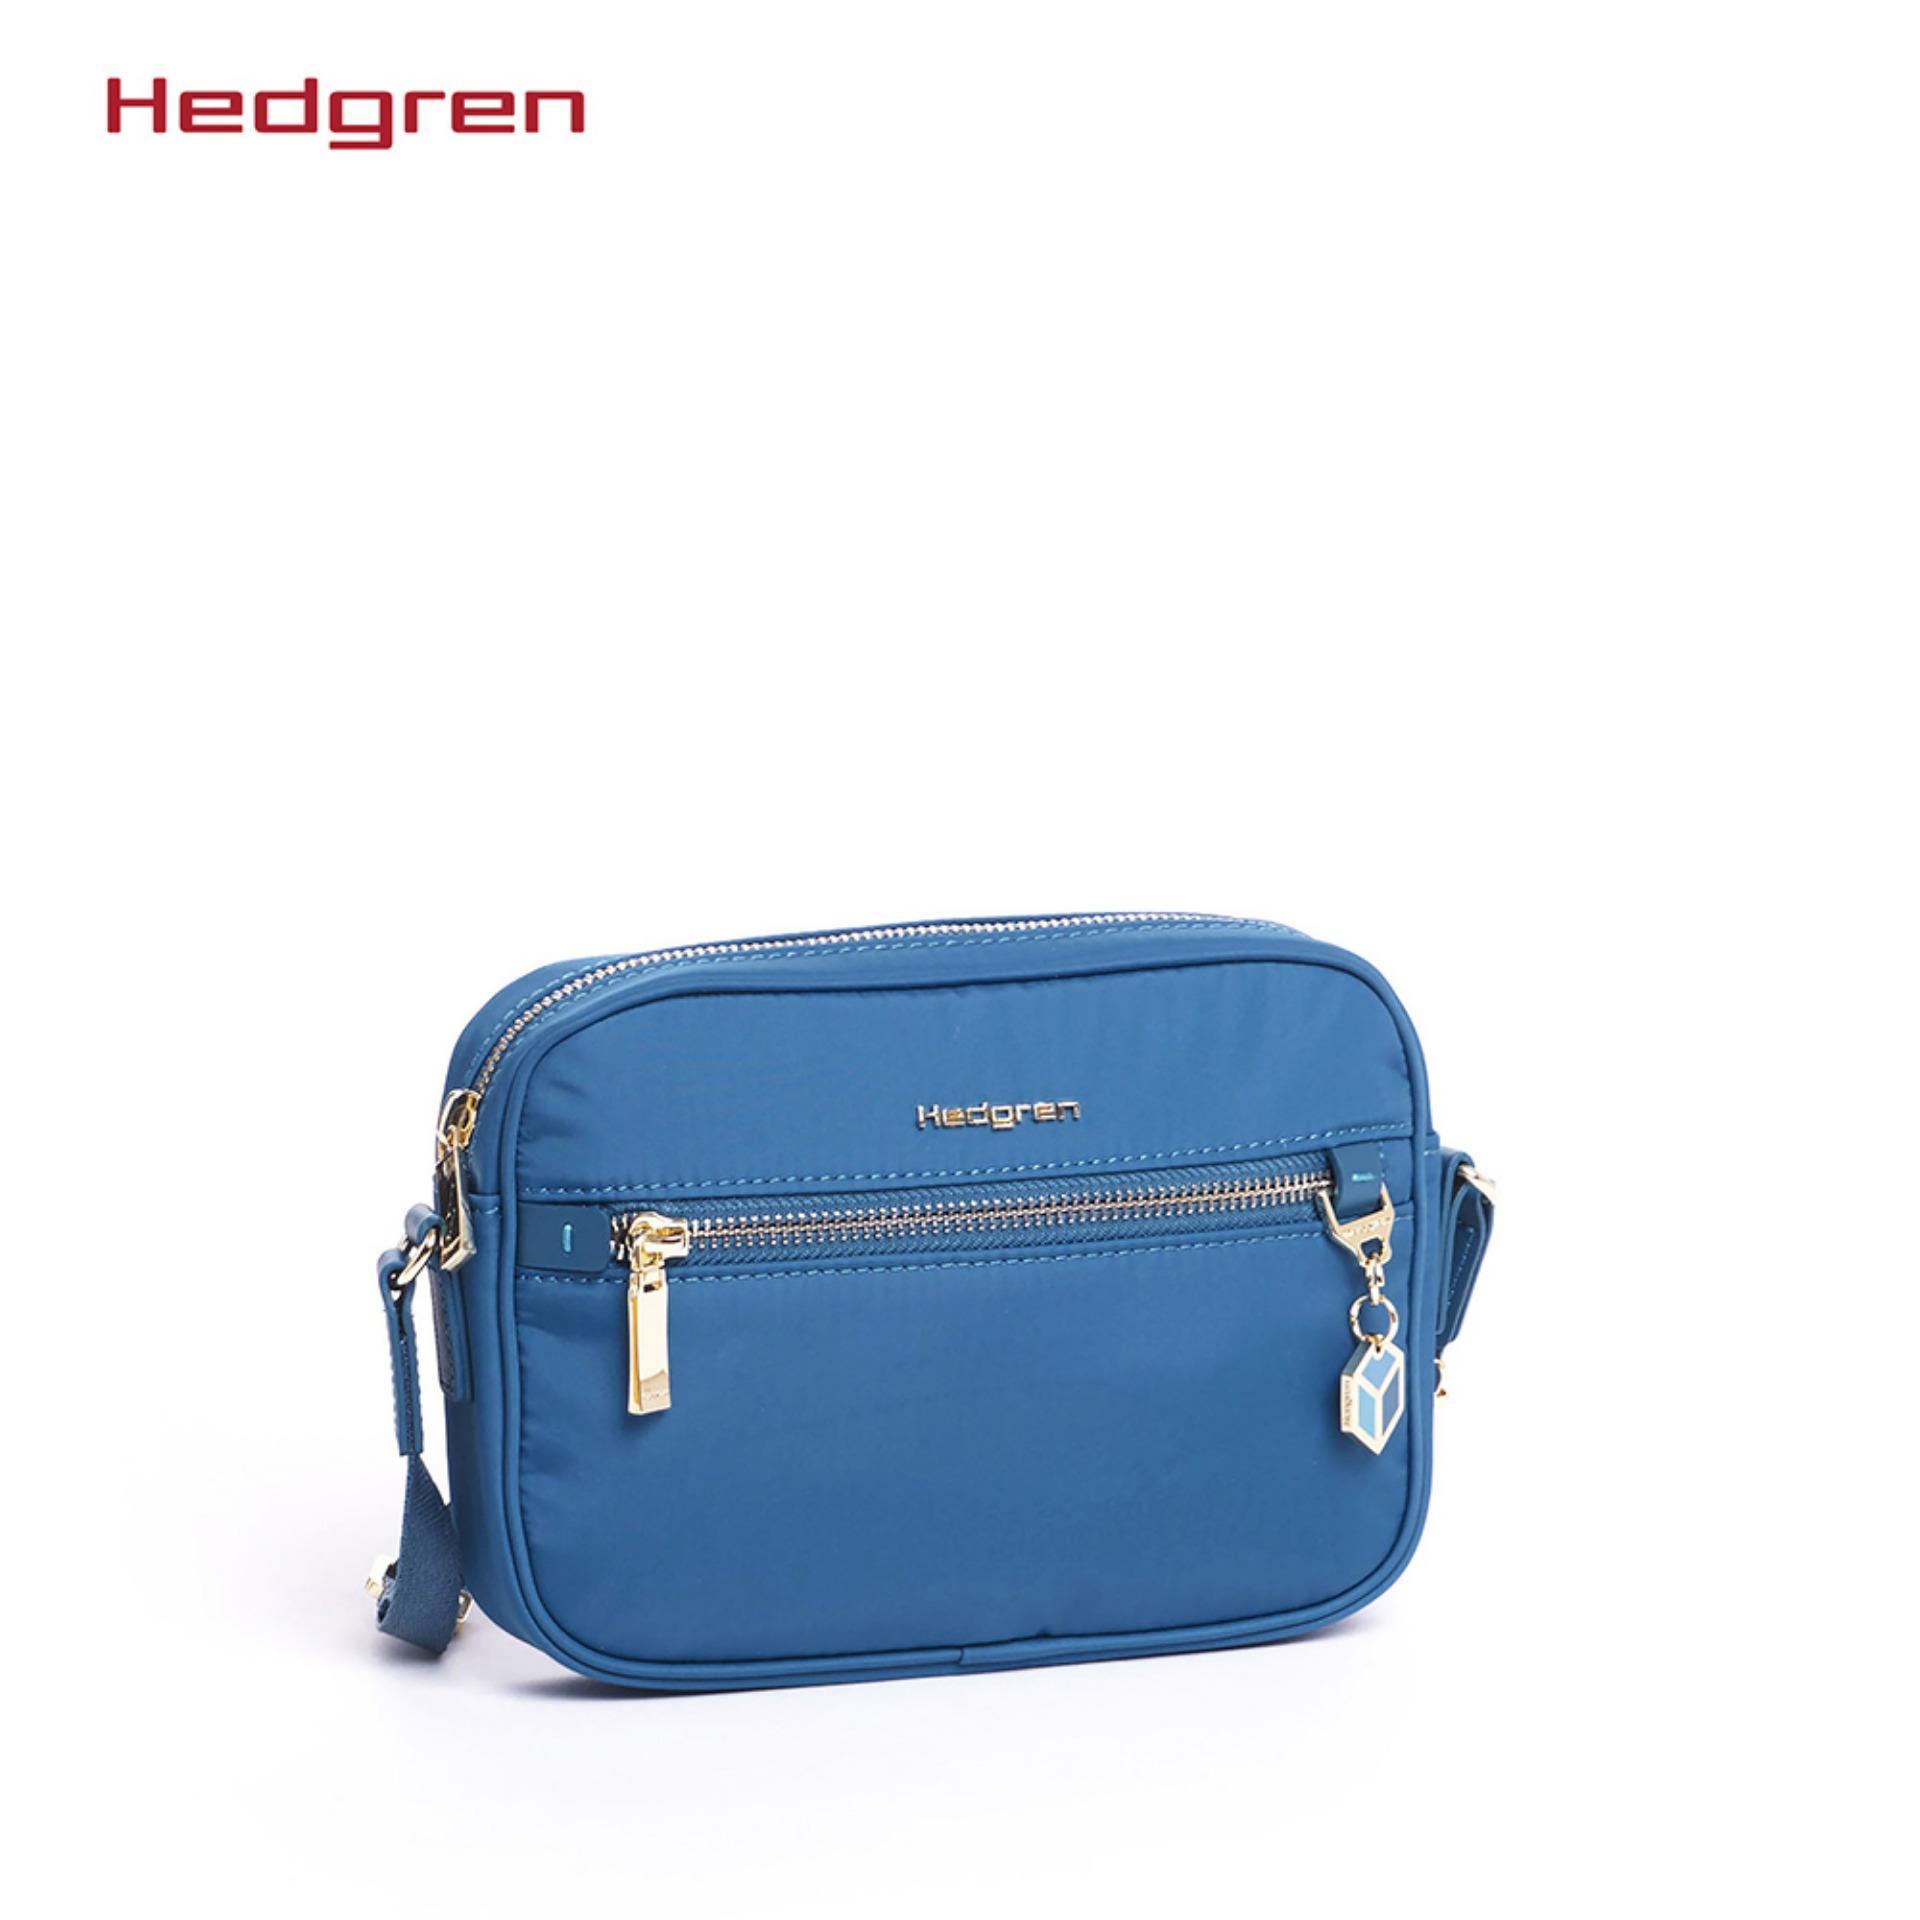 20ec42b77e73 Hedgren Eve M Sling Bag